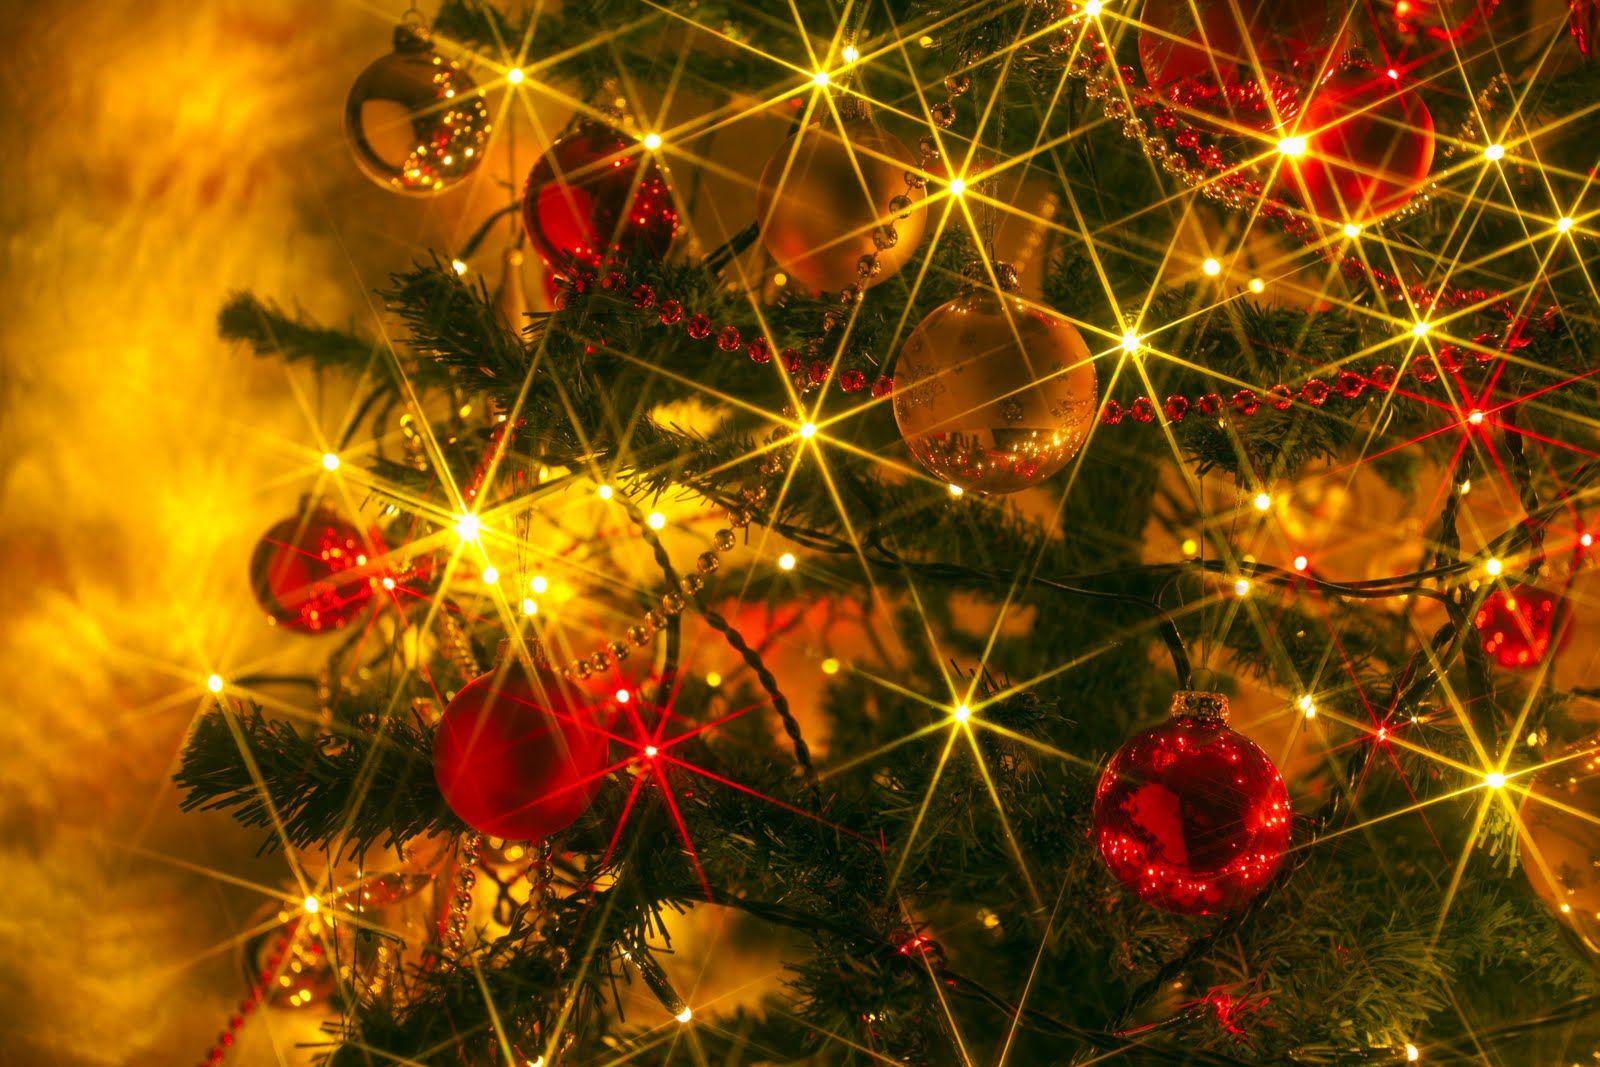 Pin by Kinda Reiter on Breathtaking Beauty | Pinterest | Christmas ...